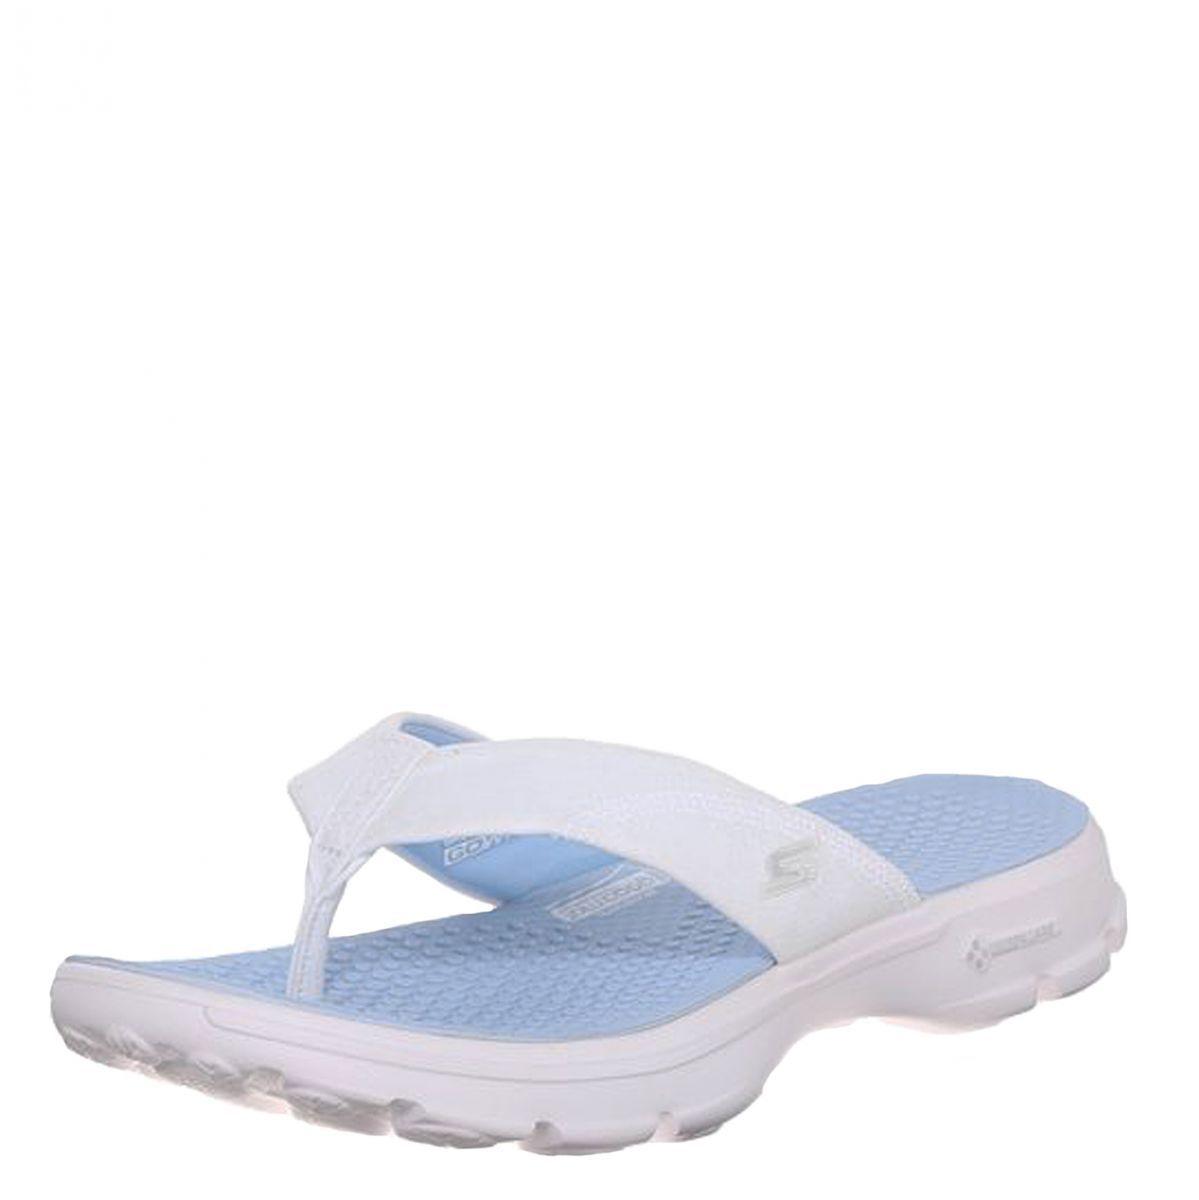 Discount Womens Skechers Go Walk Flip Flops | Black White